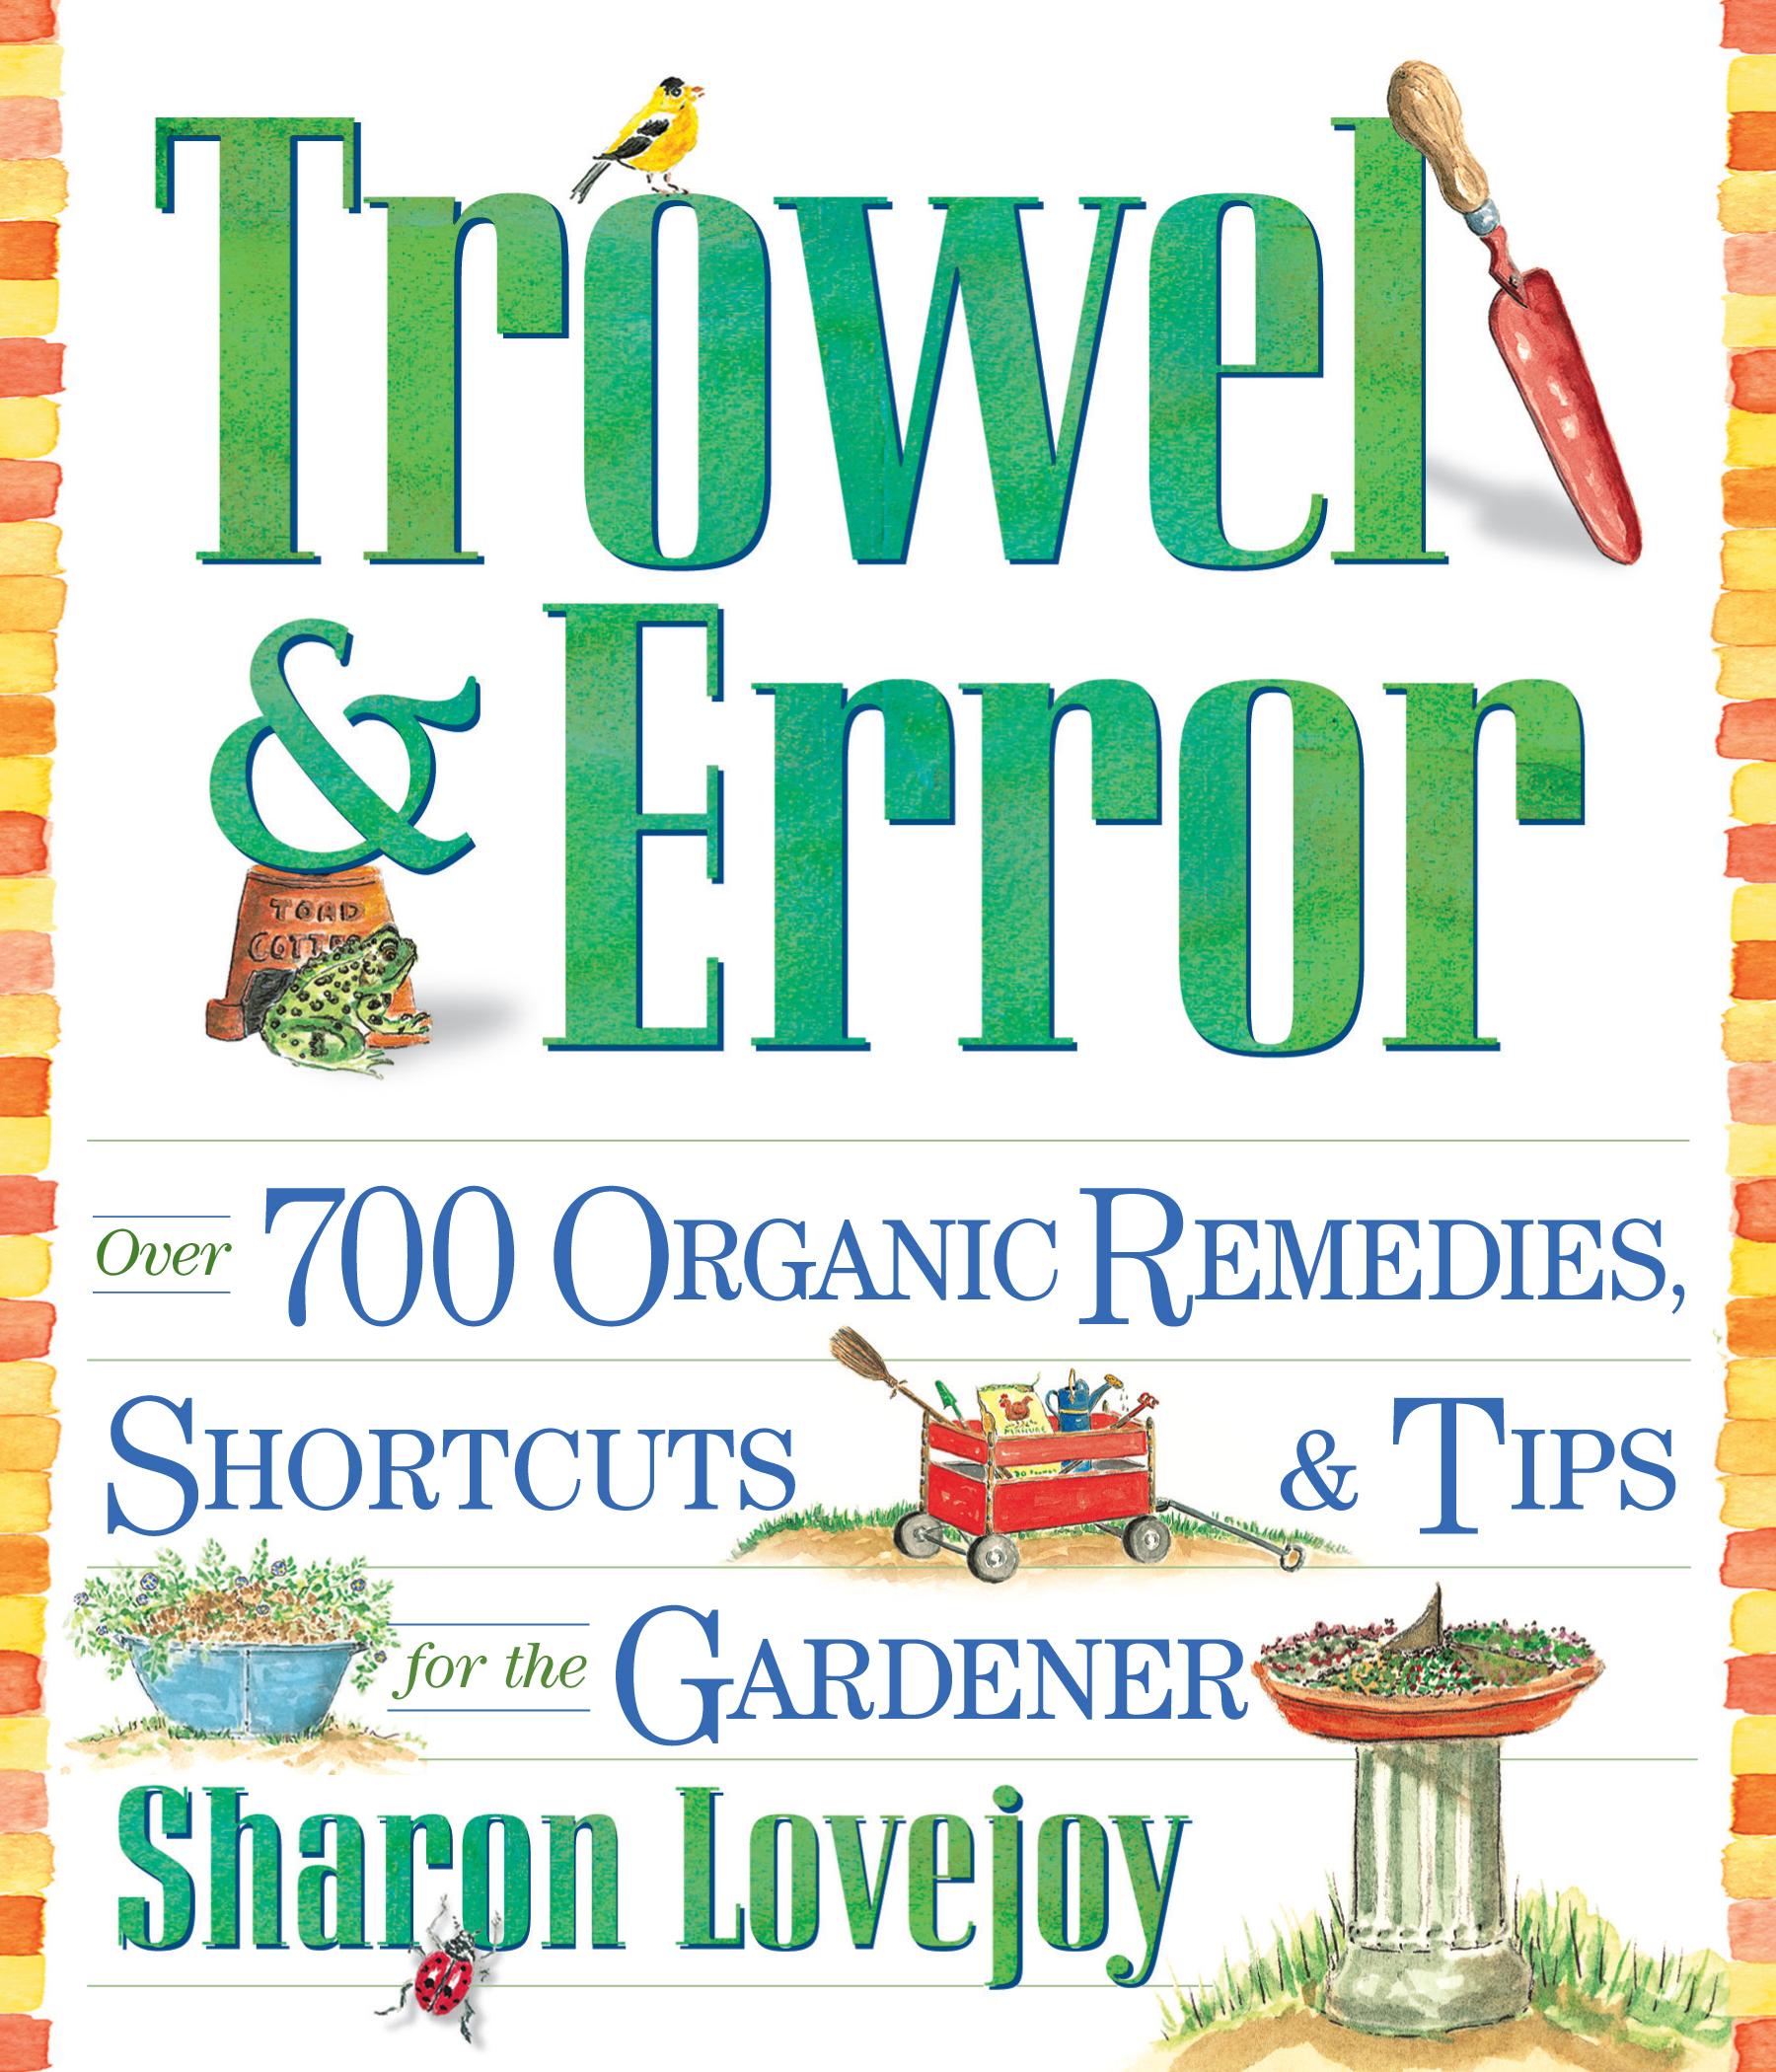 Trowel & Error_image.jpg